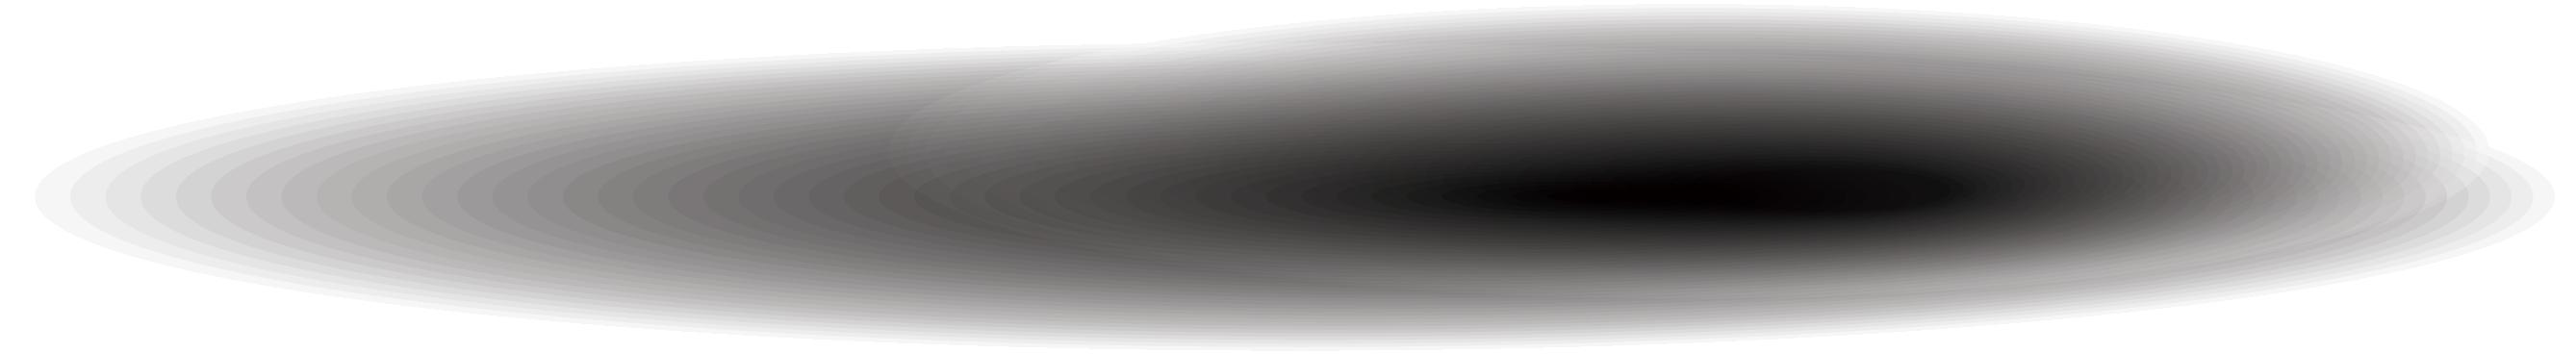 Gradient Shadow Blot